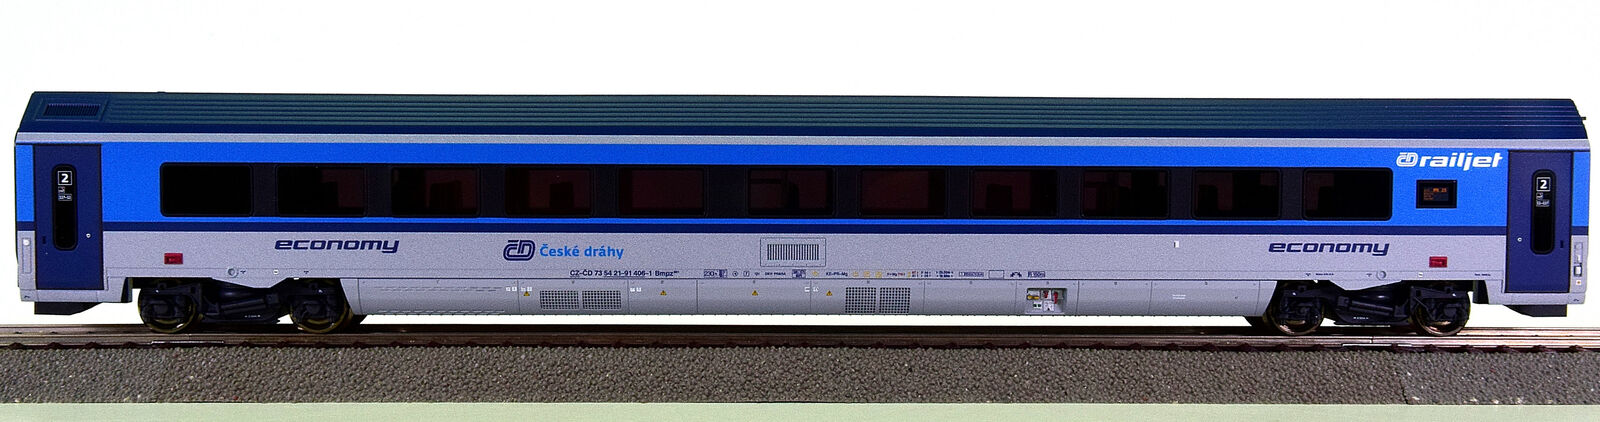 Roco 64699 – 2. clase railjet-viajeros de CD (estado checo tren)